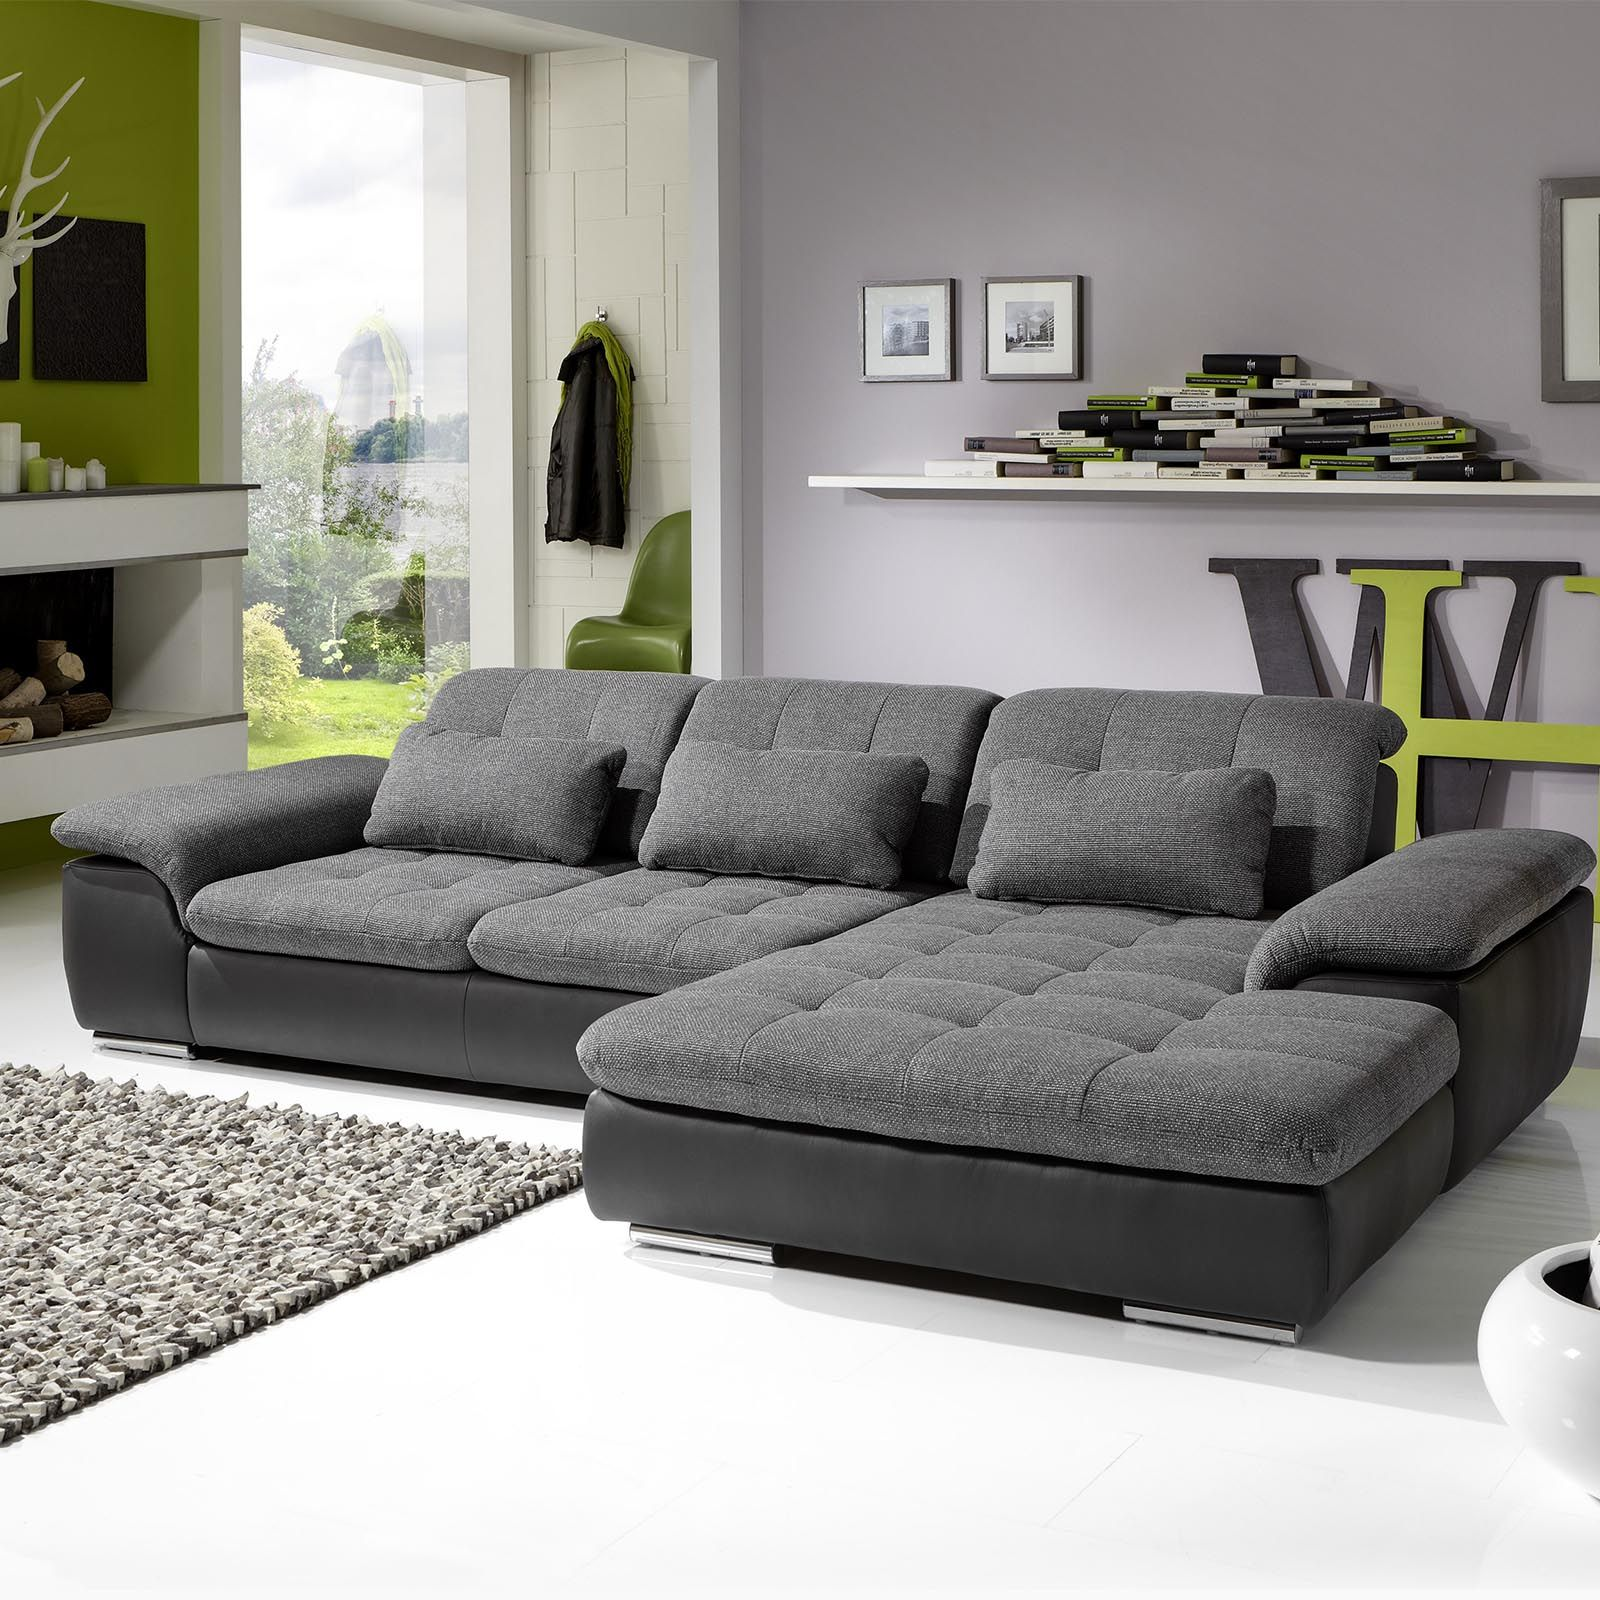 megapol sofa isola dundee utd sofascore wohnlandschaft individuell anthrazit silver modern